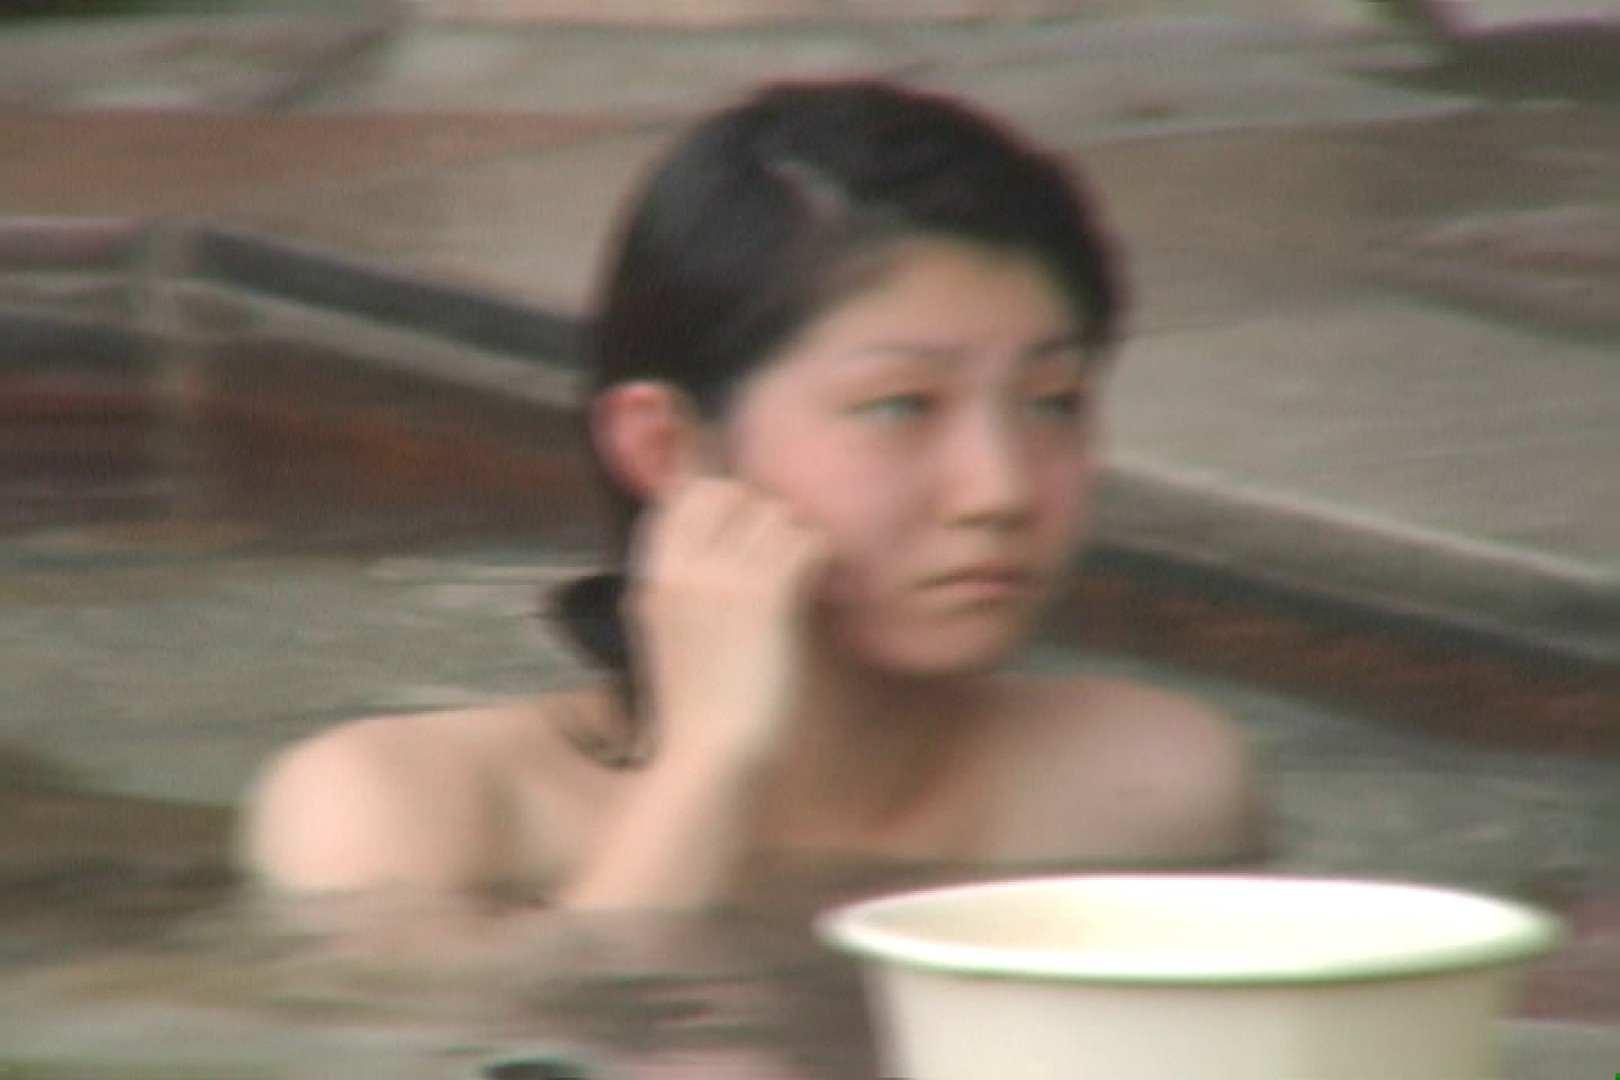 Aquaな露天風呂Vol.579 露天   OLセックス  52画像 40